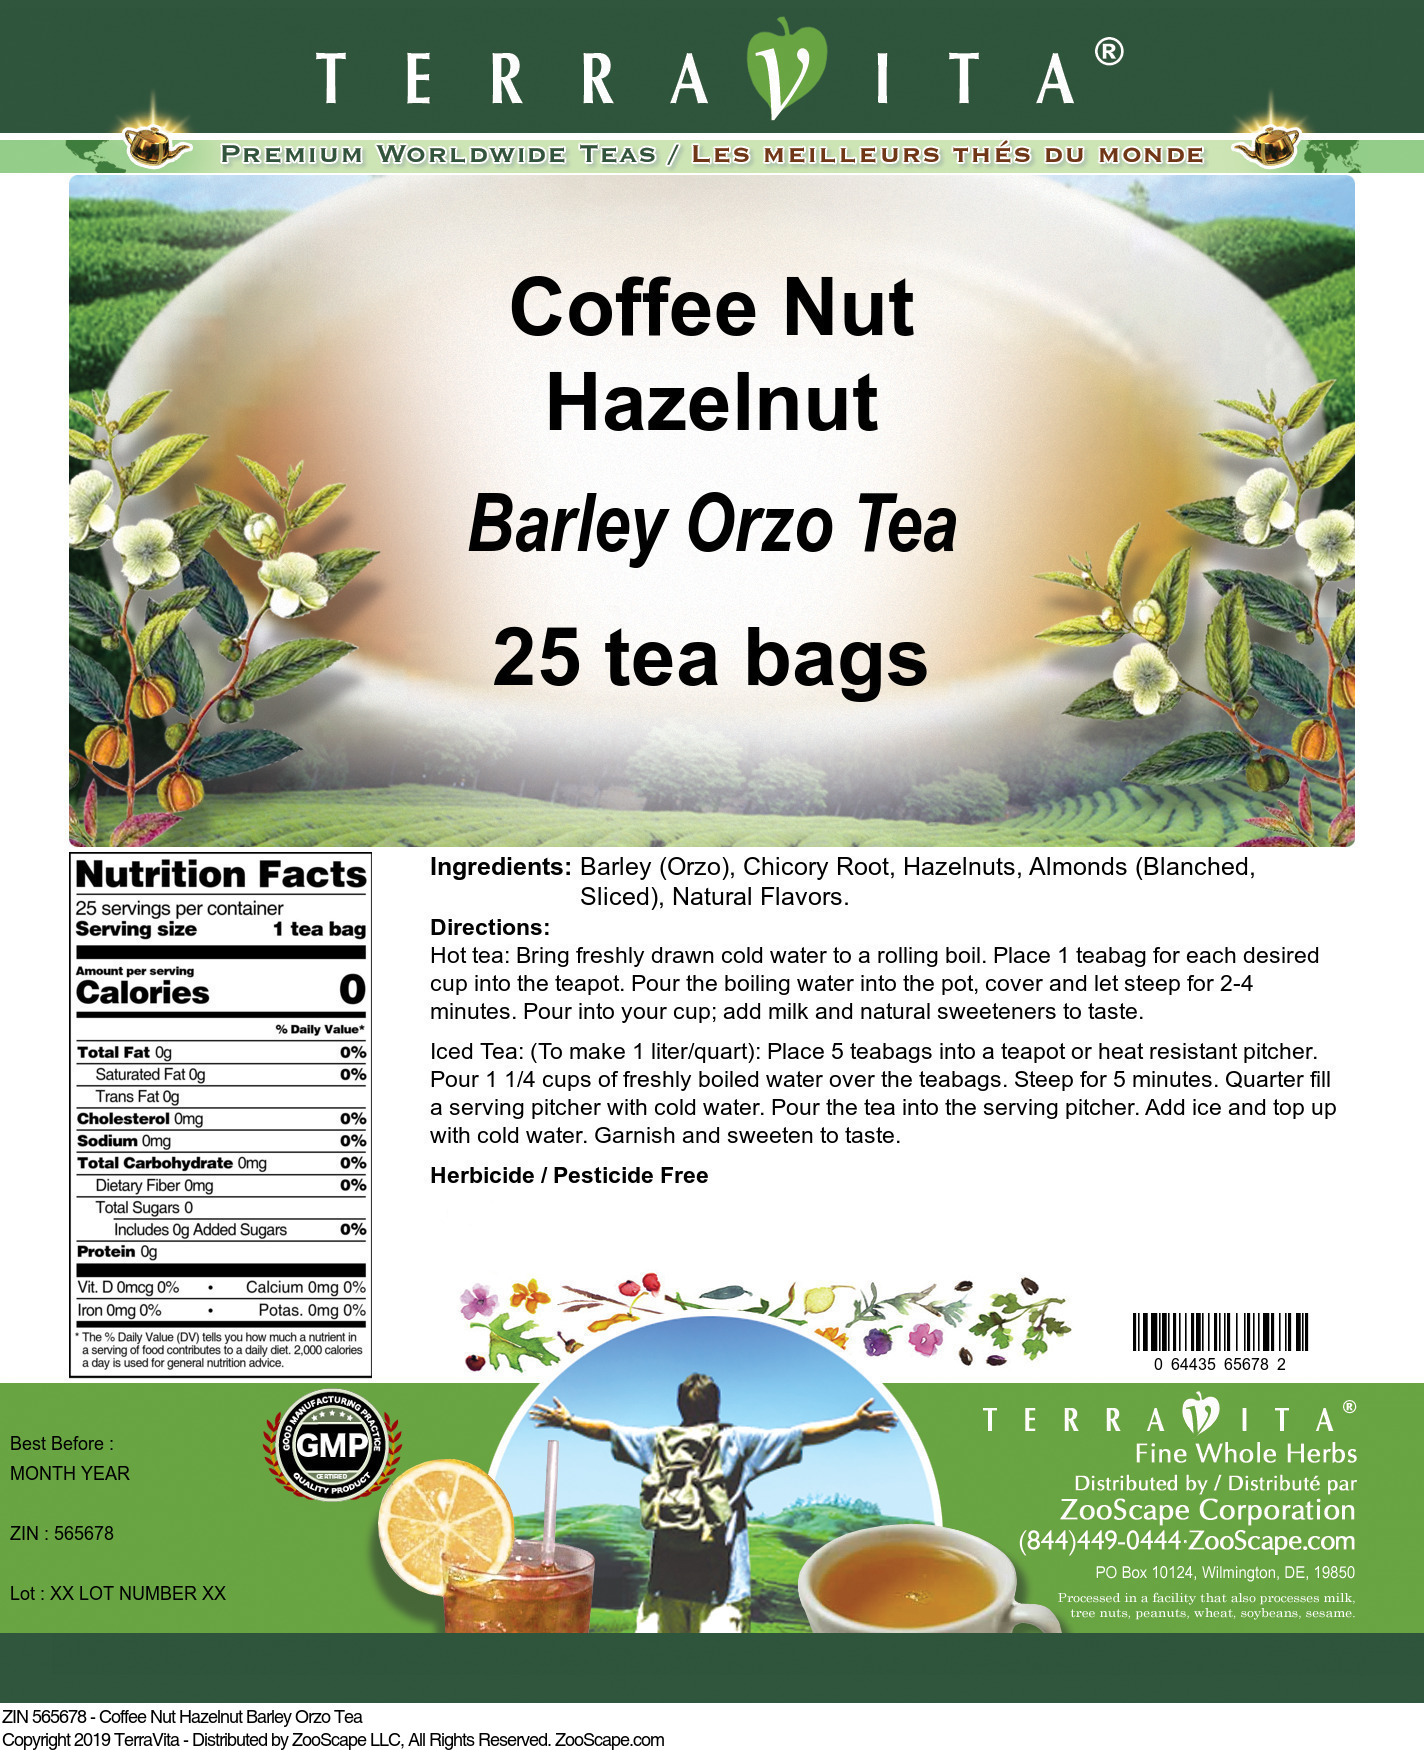 Coffee Nut Hazelnut Barley Orzo Tea